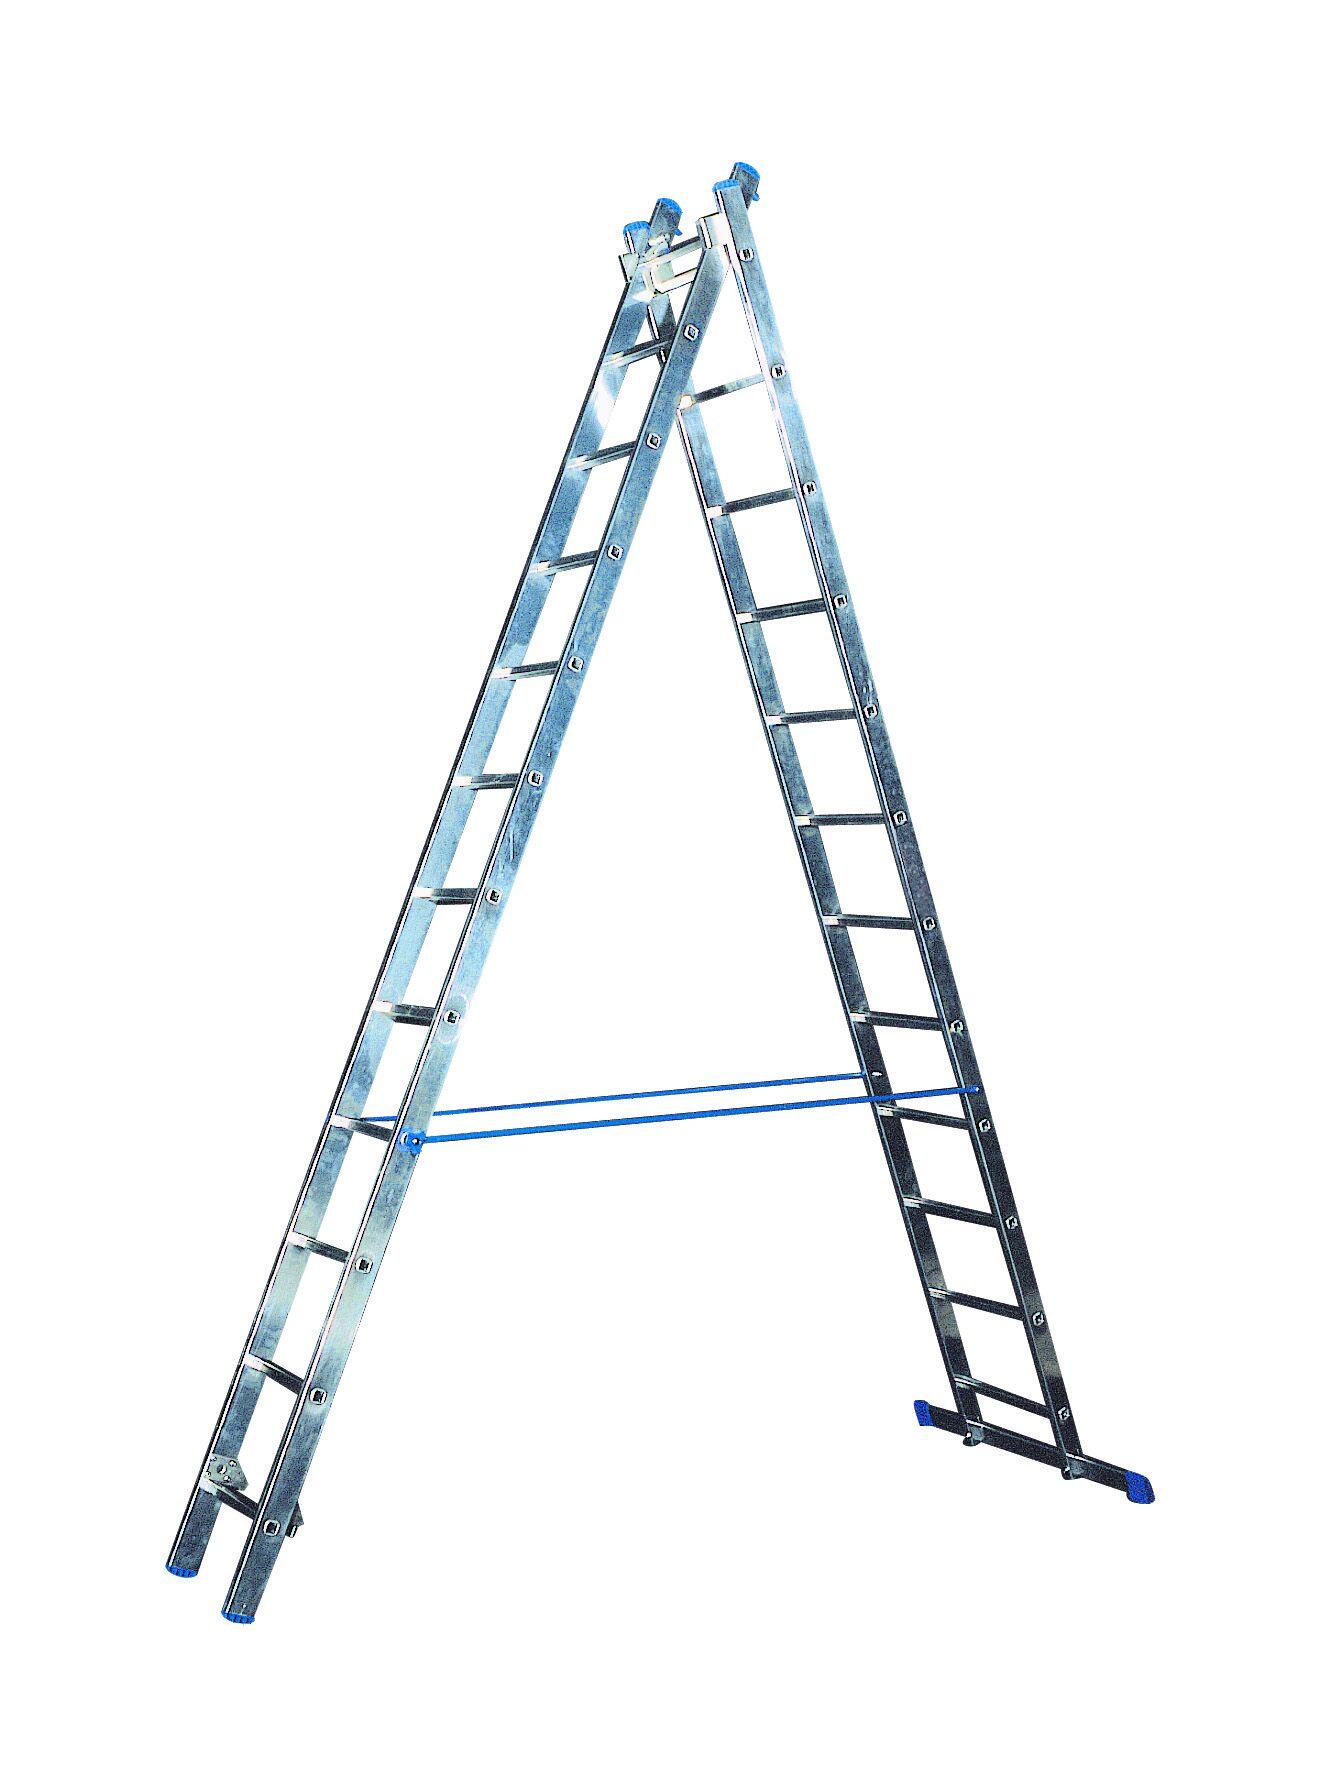 Žebřík hliníkový víceučelový HOBBY VHR H 2x9 Al